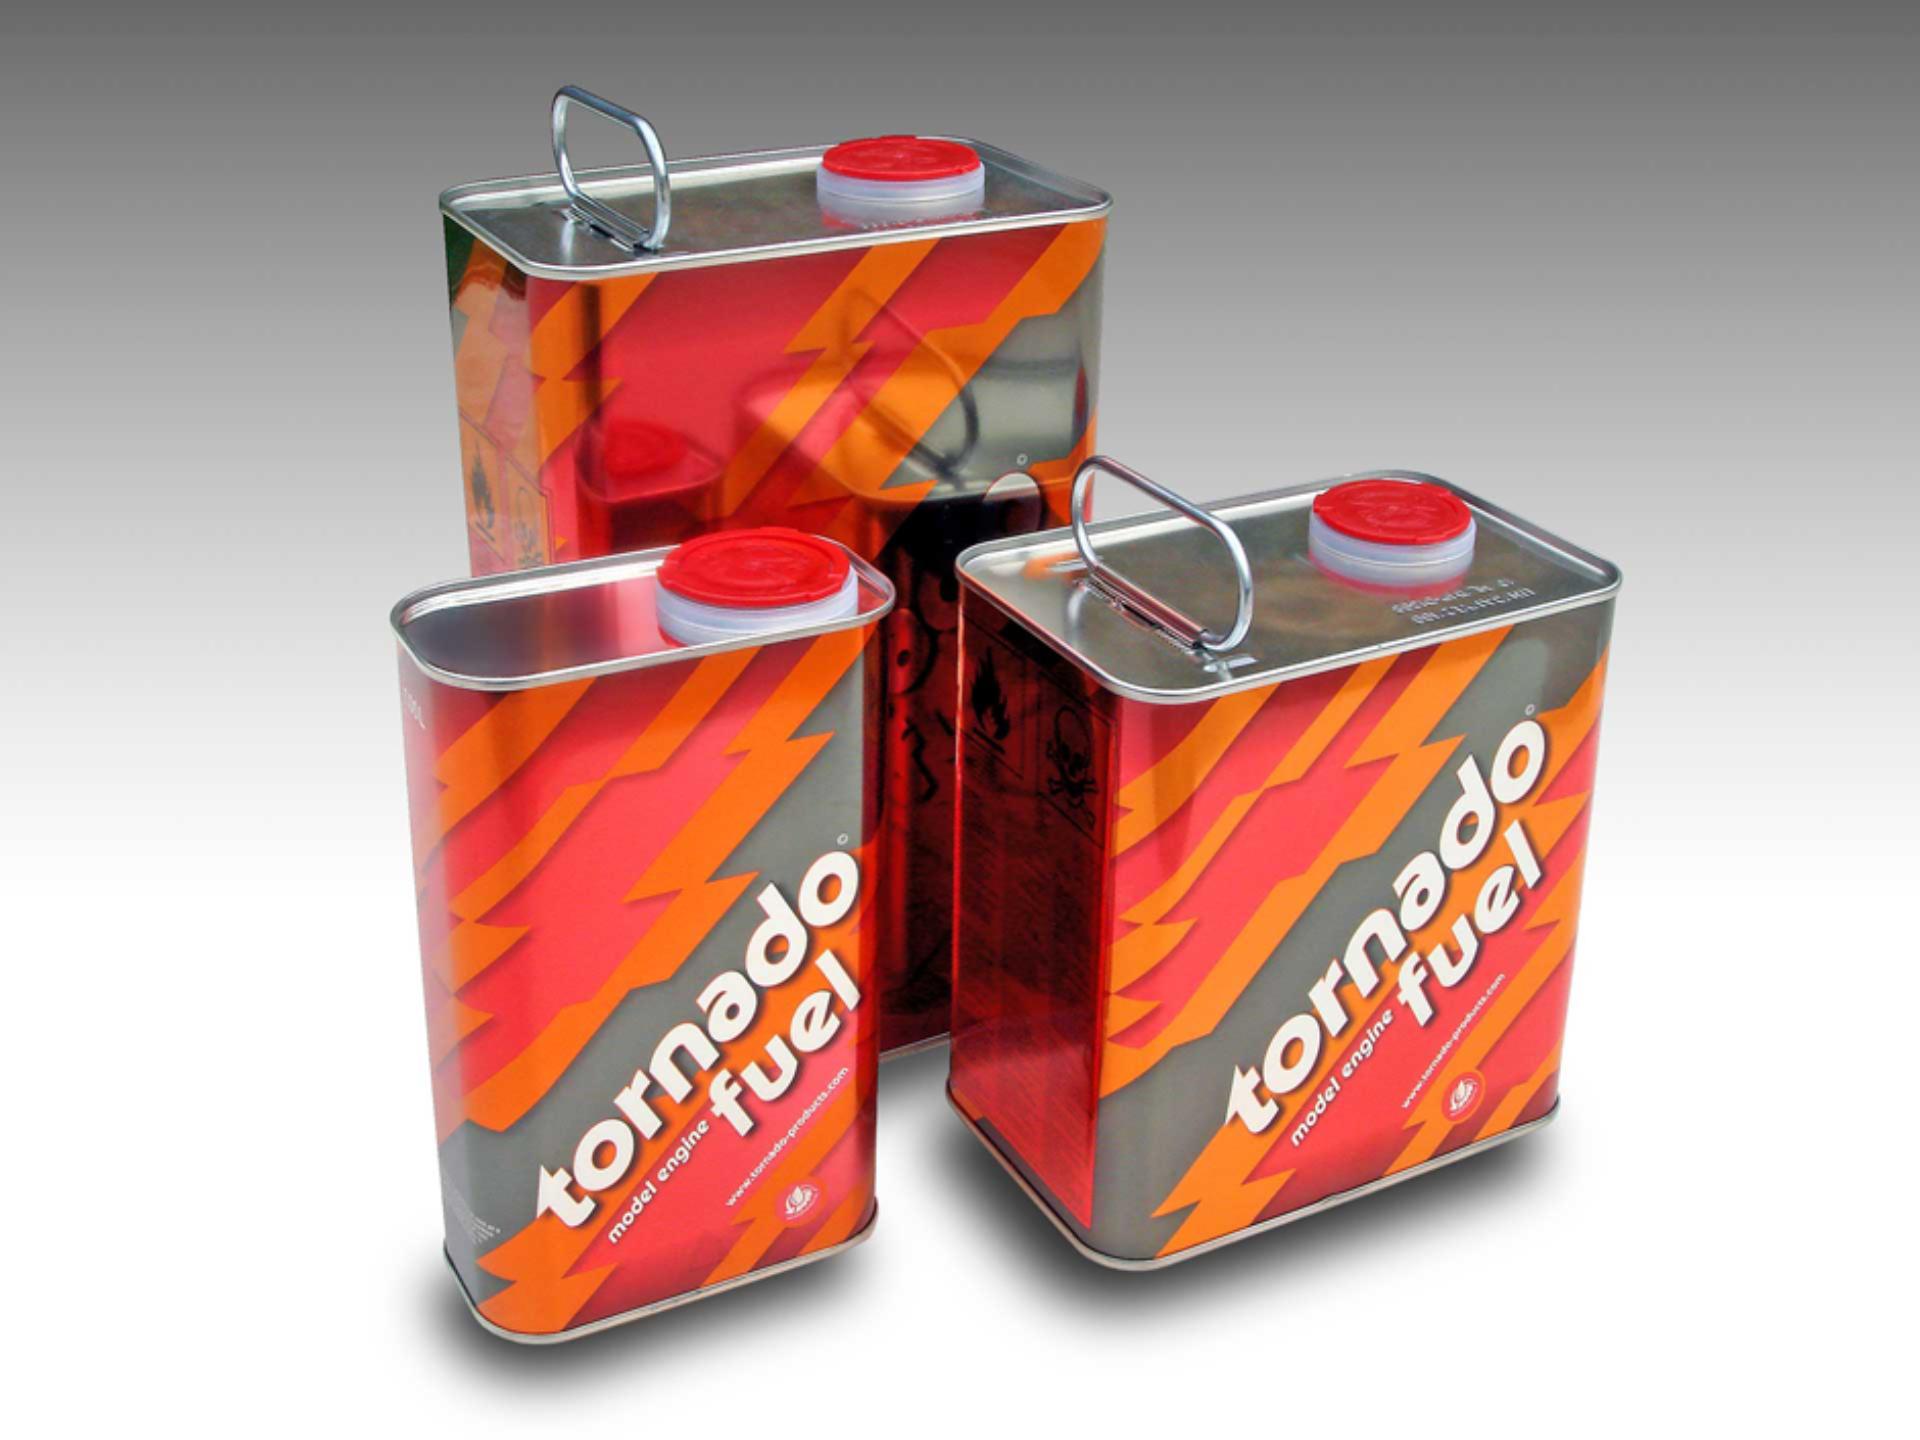 Tornado Fuel - Rene Verkaart)